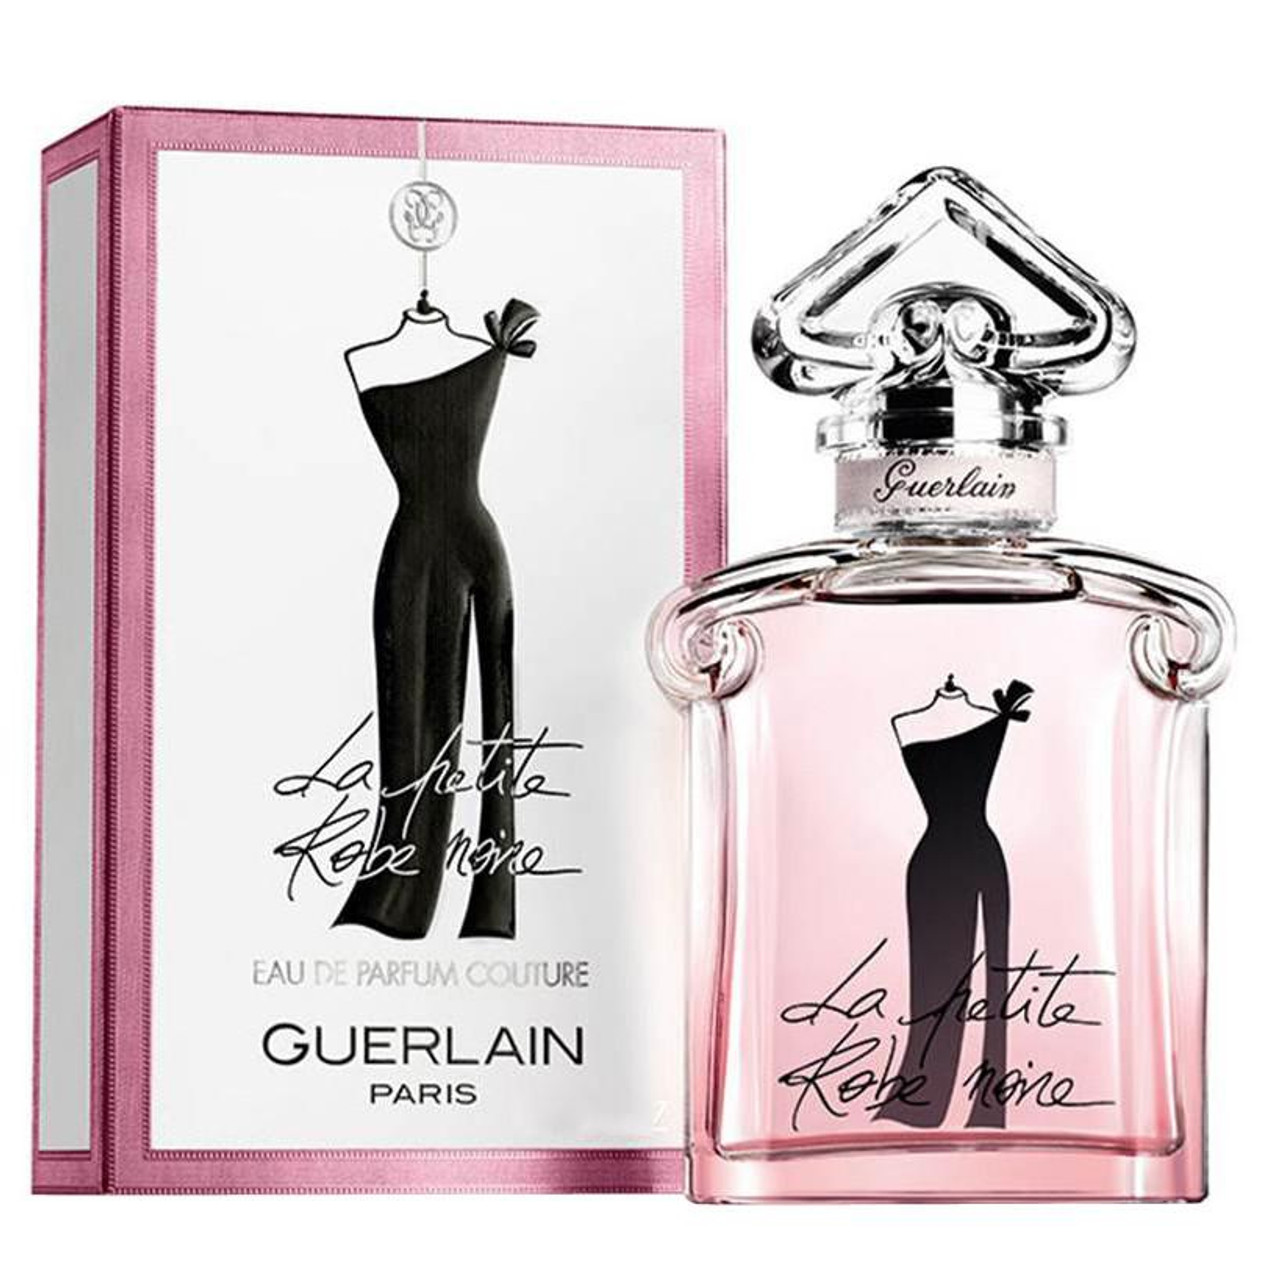 154a6f1e55d La Petite Robe Noire Couture 100ml edp (Women). - Desire Perfumes